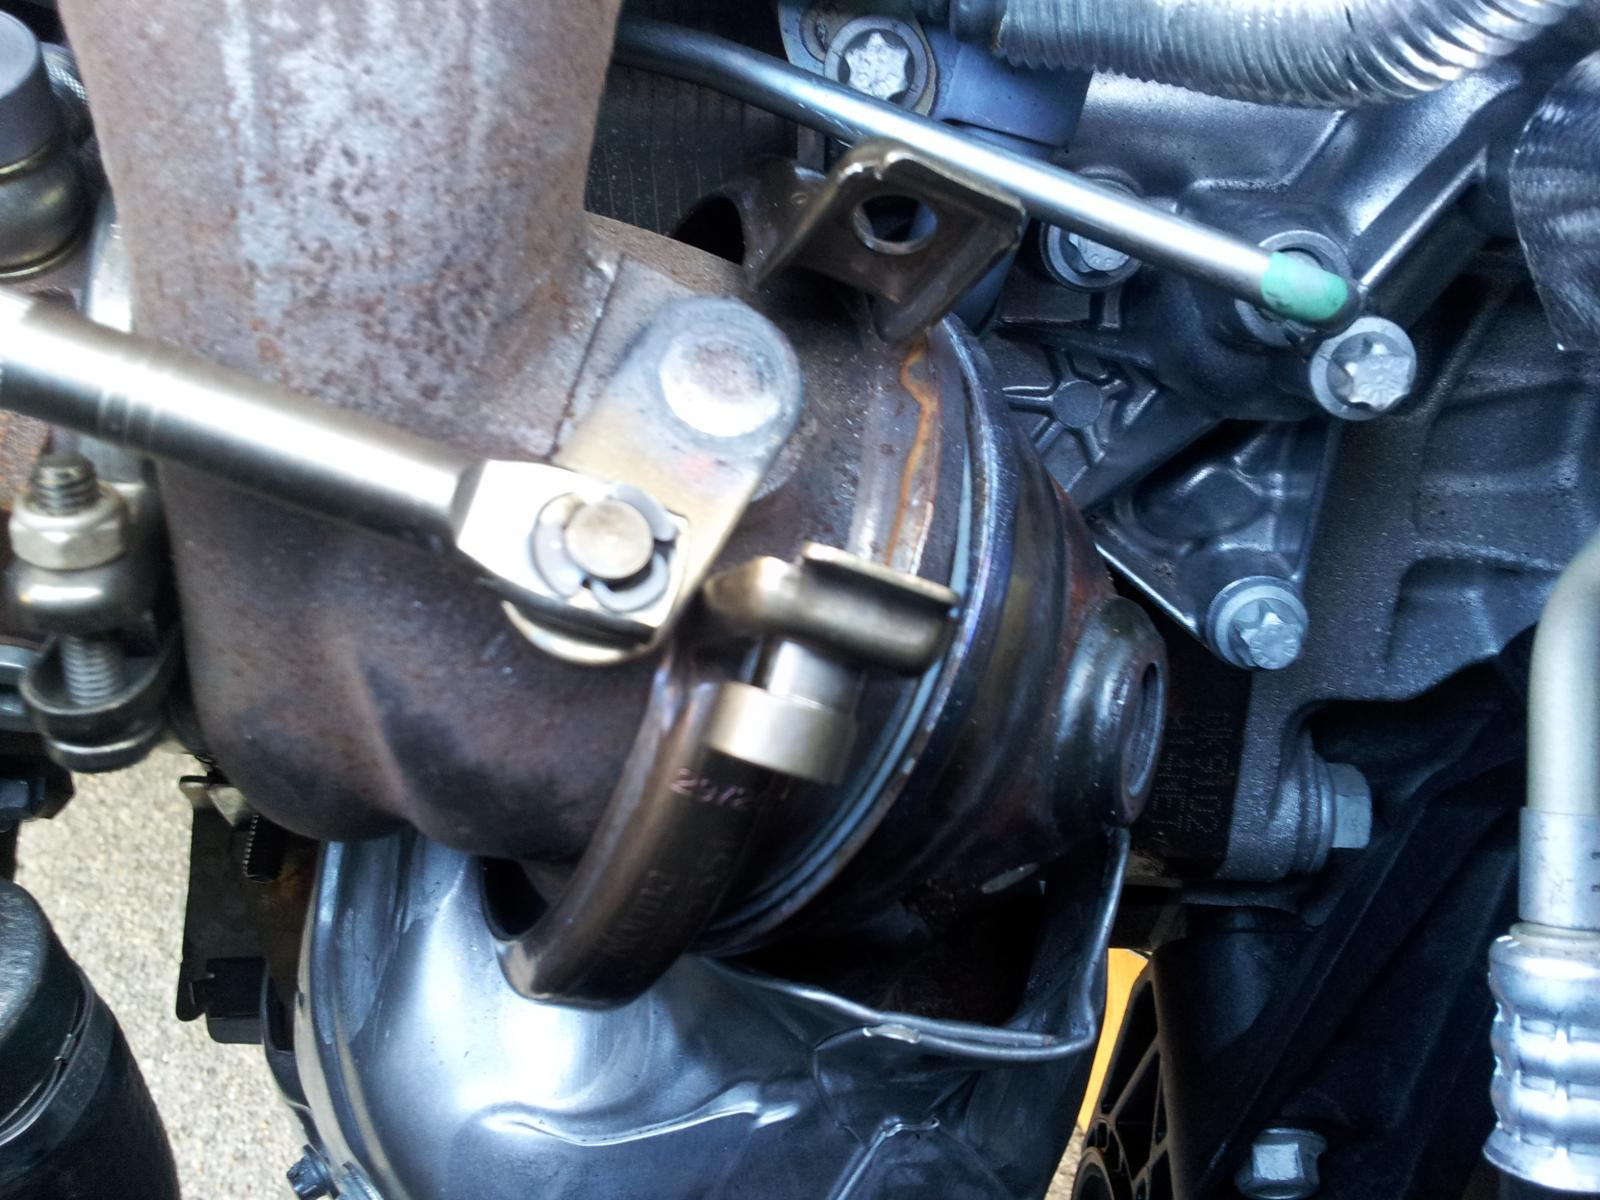 D Zzp O Midpipe Installation on Chevy Malibu Camshaft Position Sensor Location